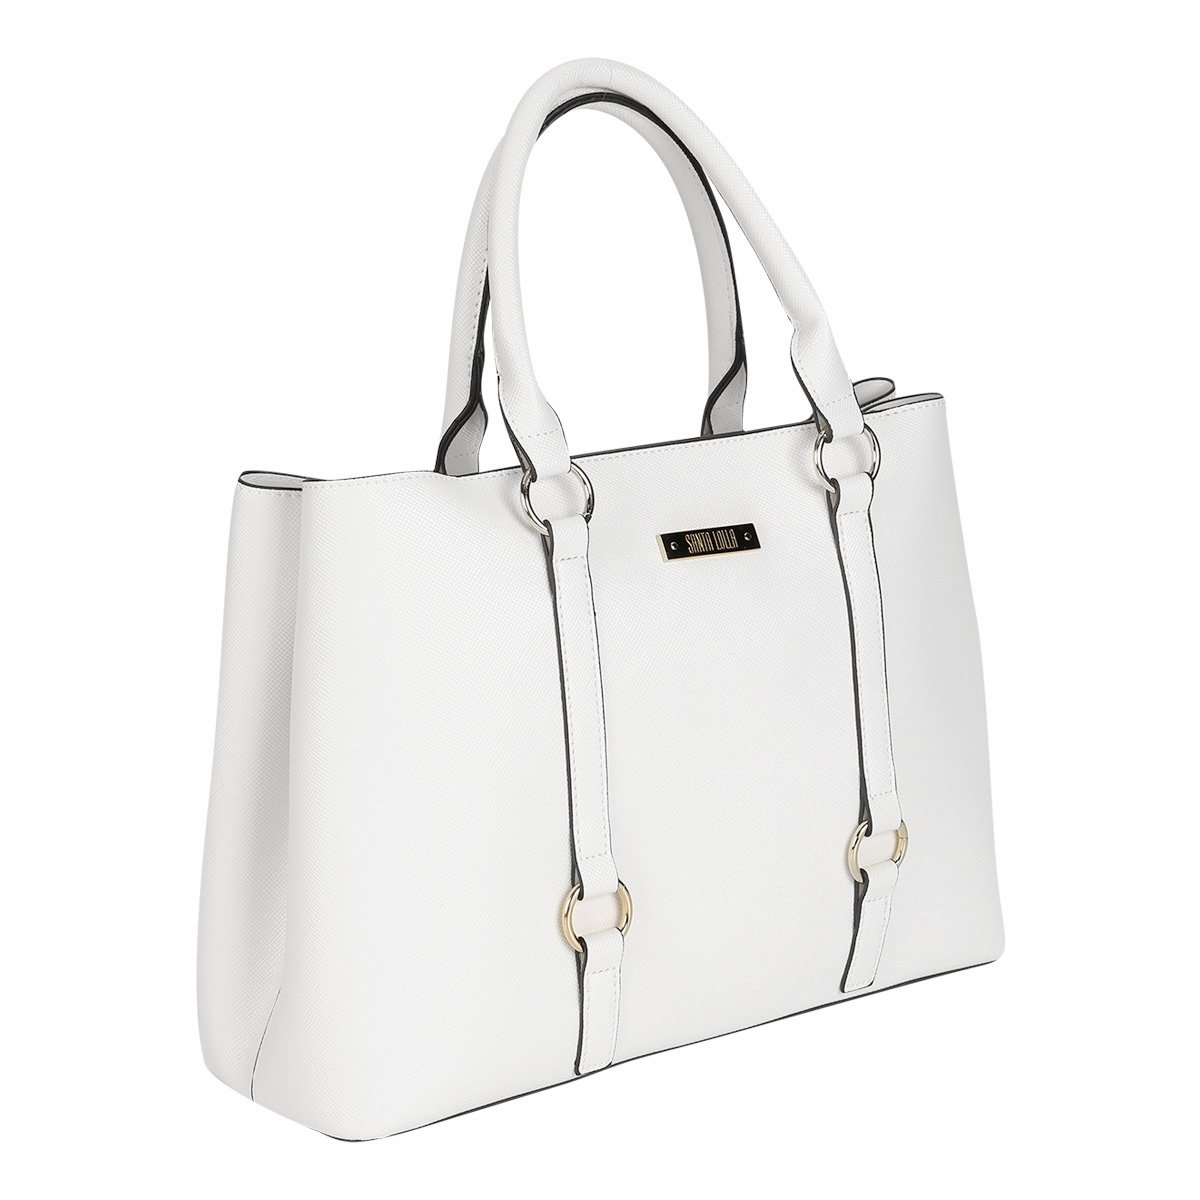 Bolsa Santa Lolla Shopper Argolas Alça Transversal Feminina  7a5925df2a8a4